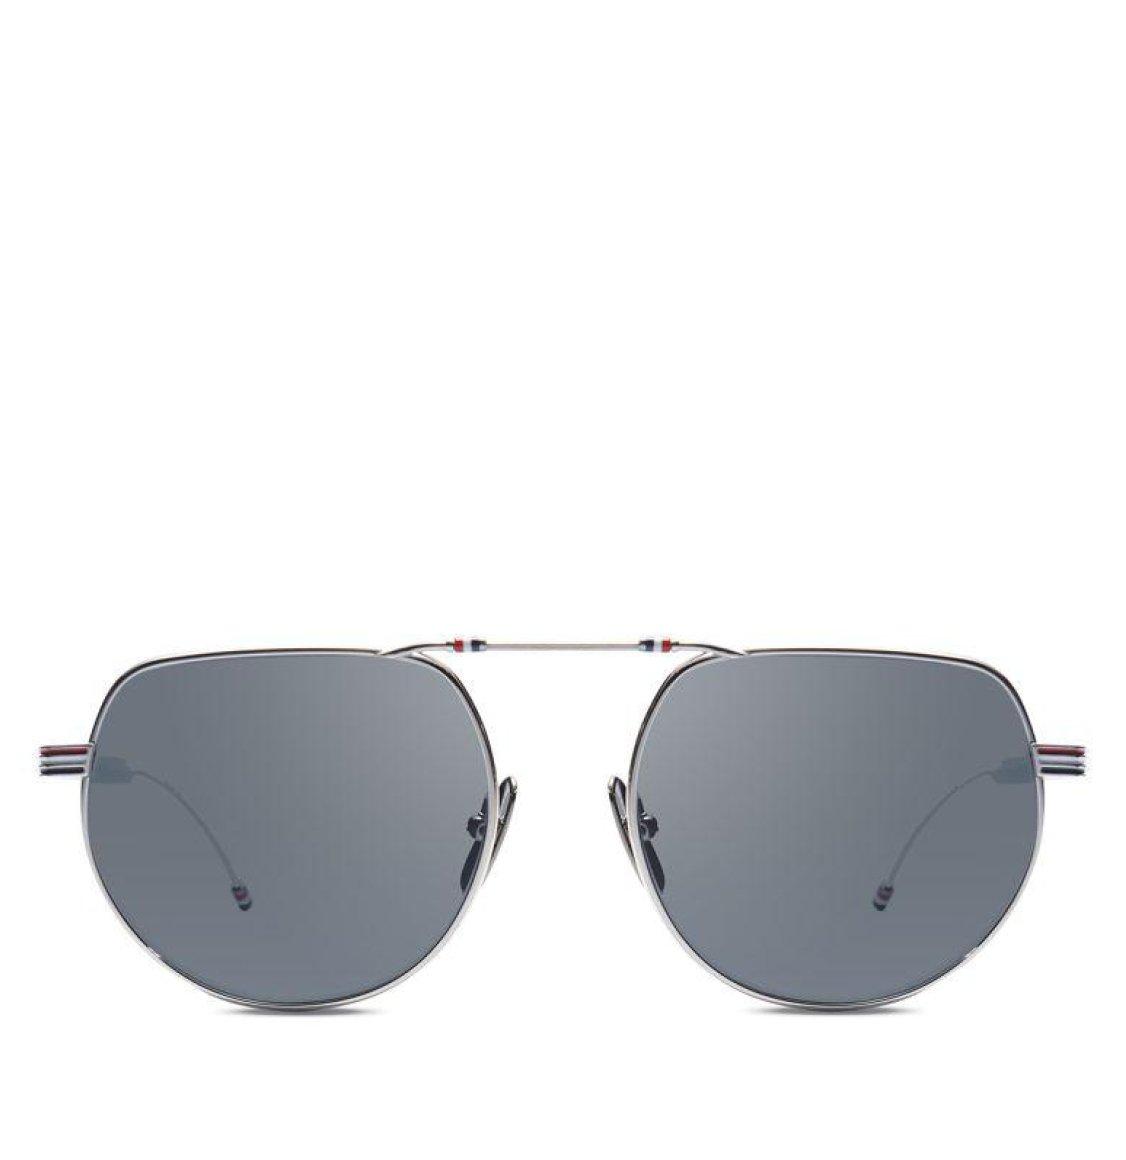 Thom Browne 51 Silver Grey Square Aviator Sunglasses Γυαλιά Ηλίου